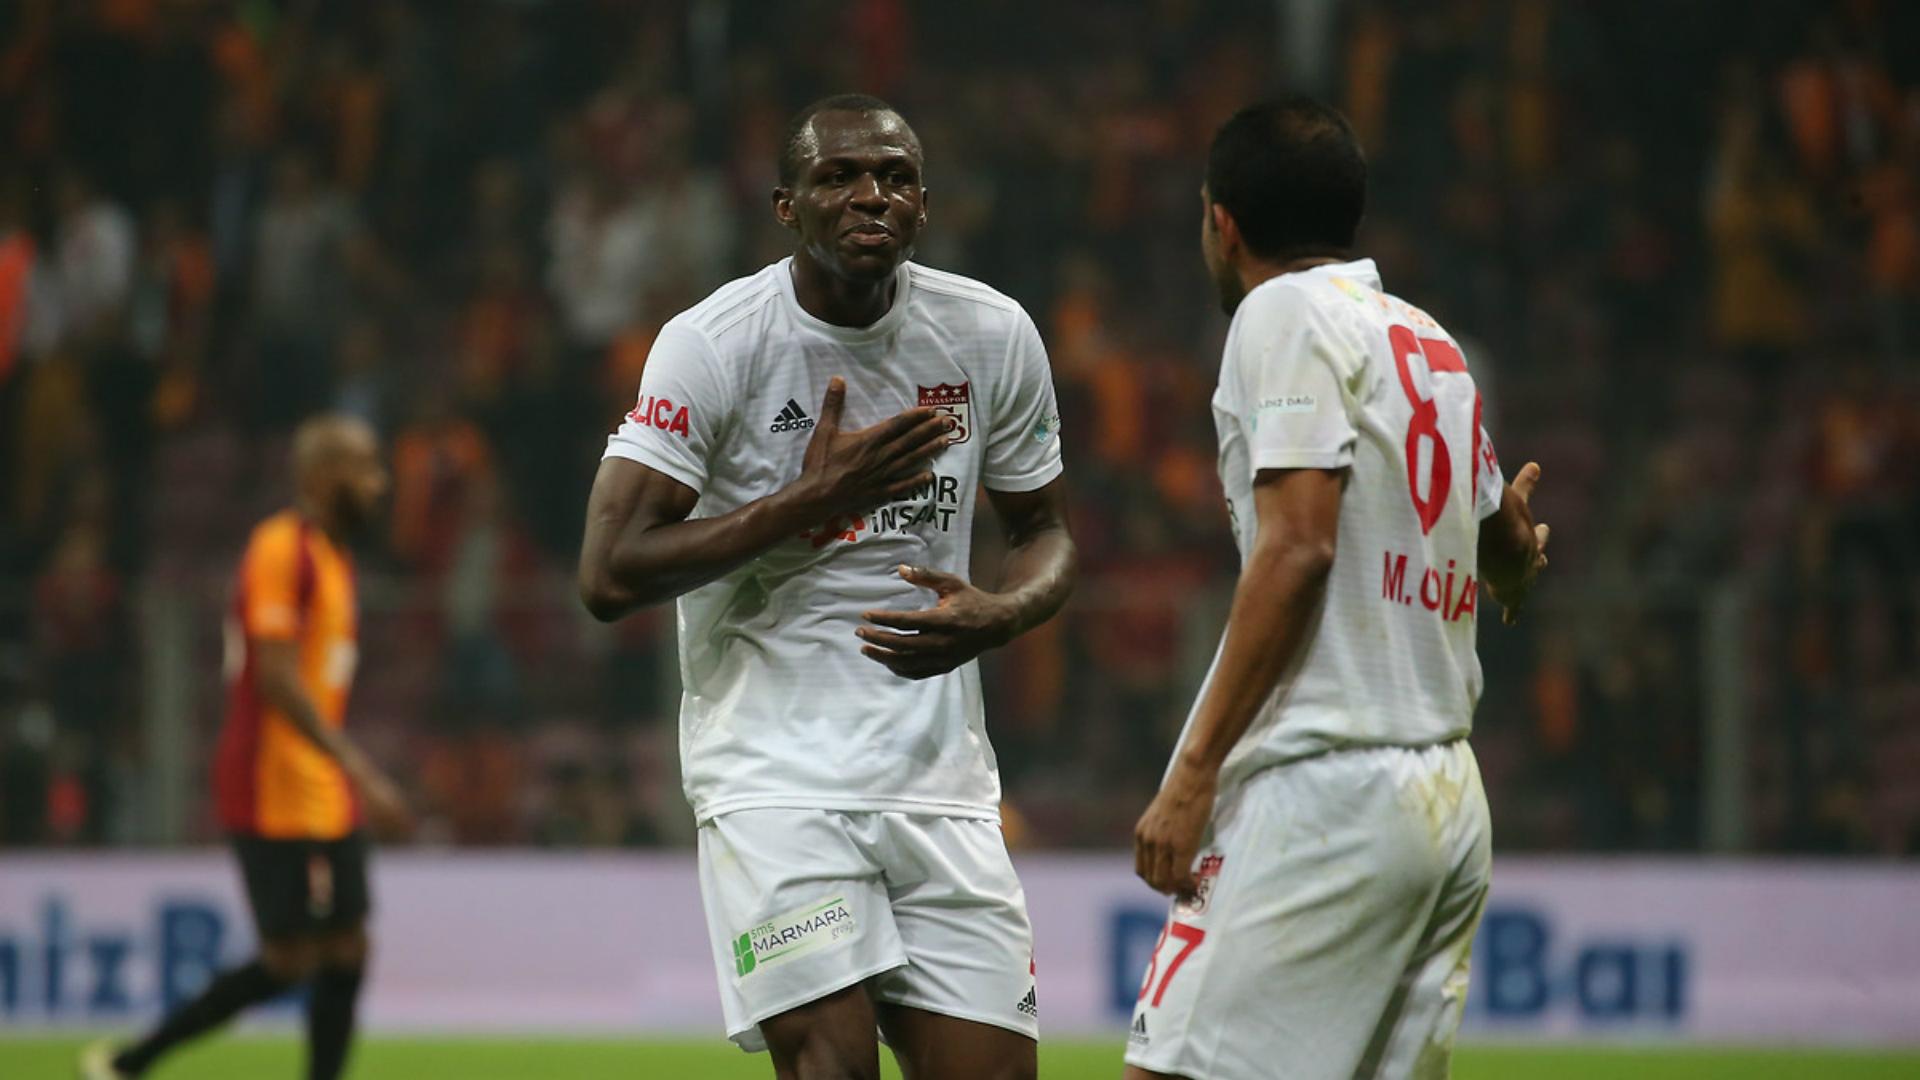 Arouna Kone scores as Sivasspor hold Konyaspor